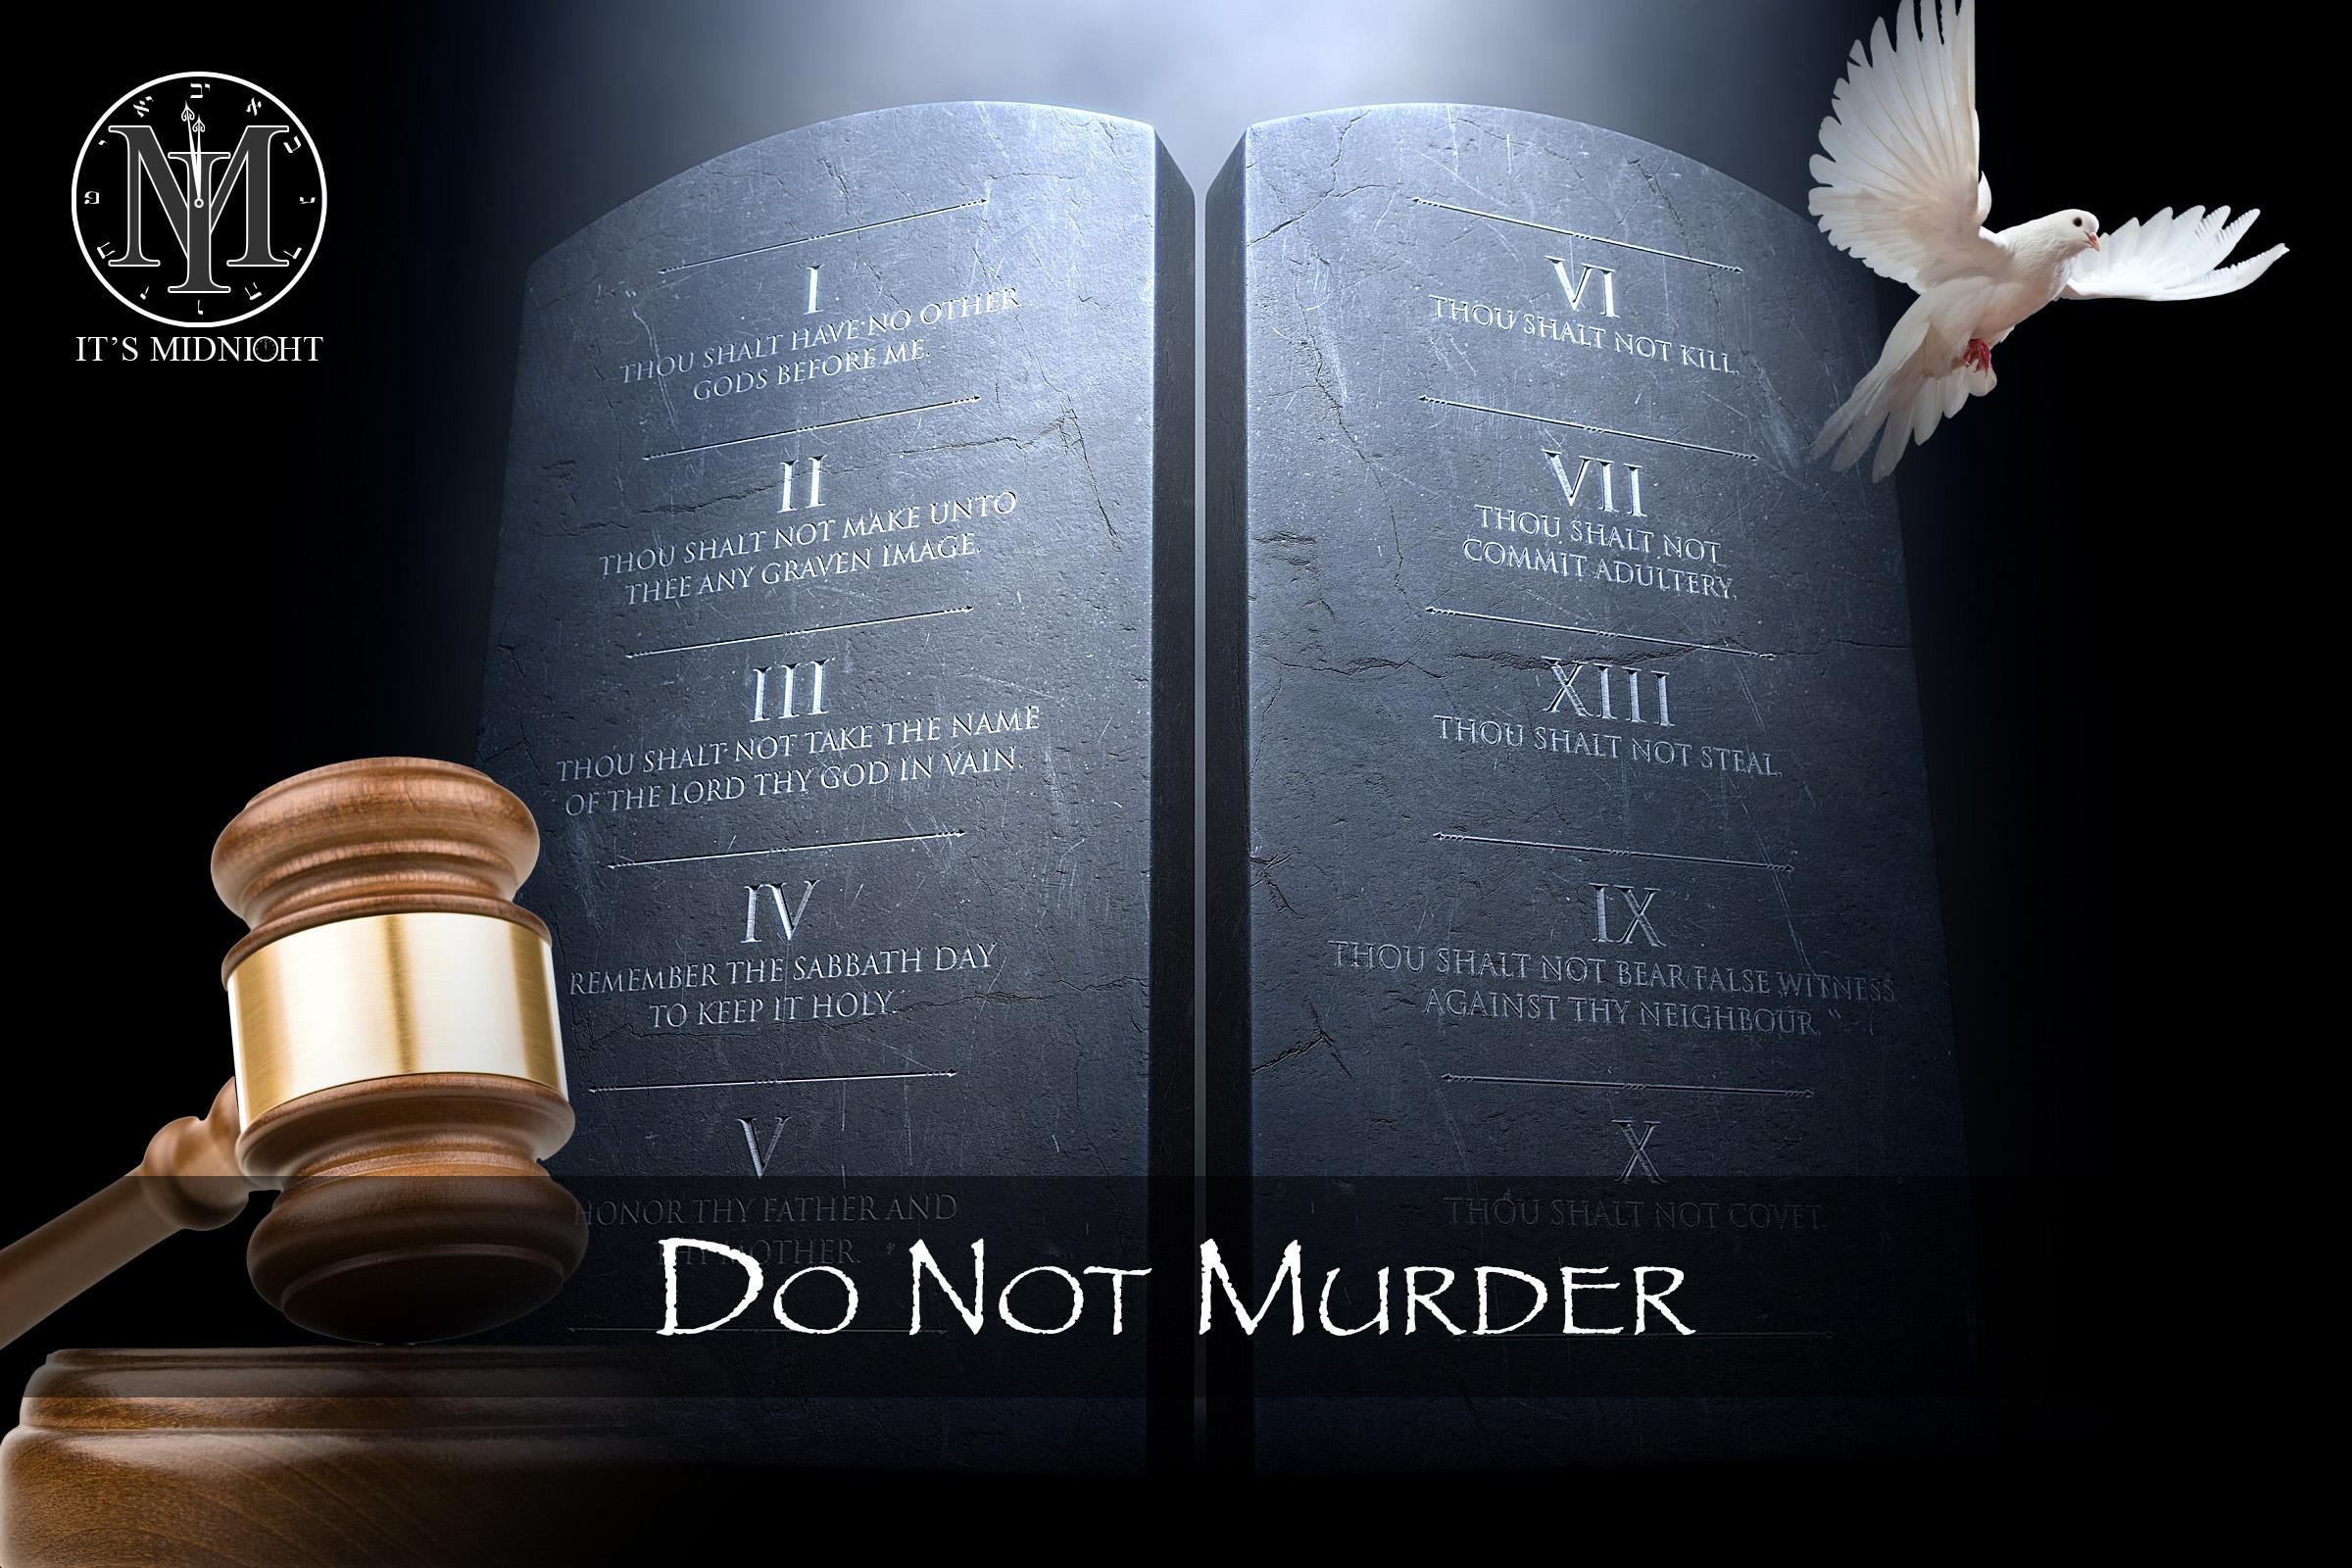 The 6th Commandment